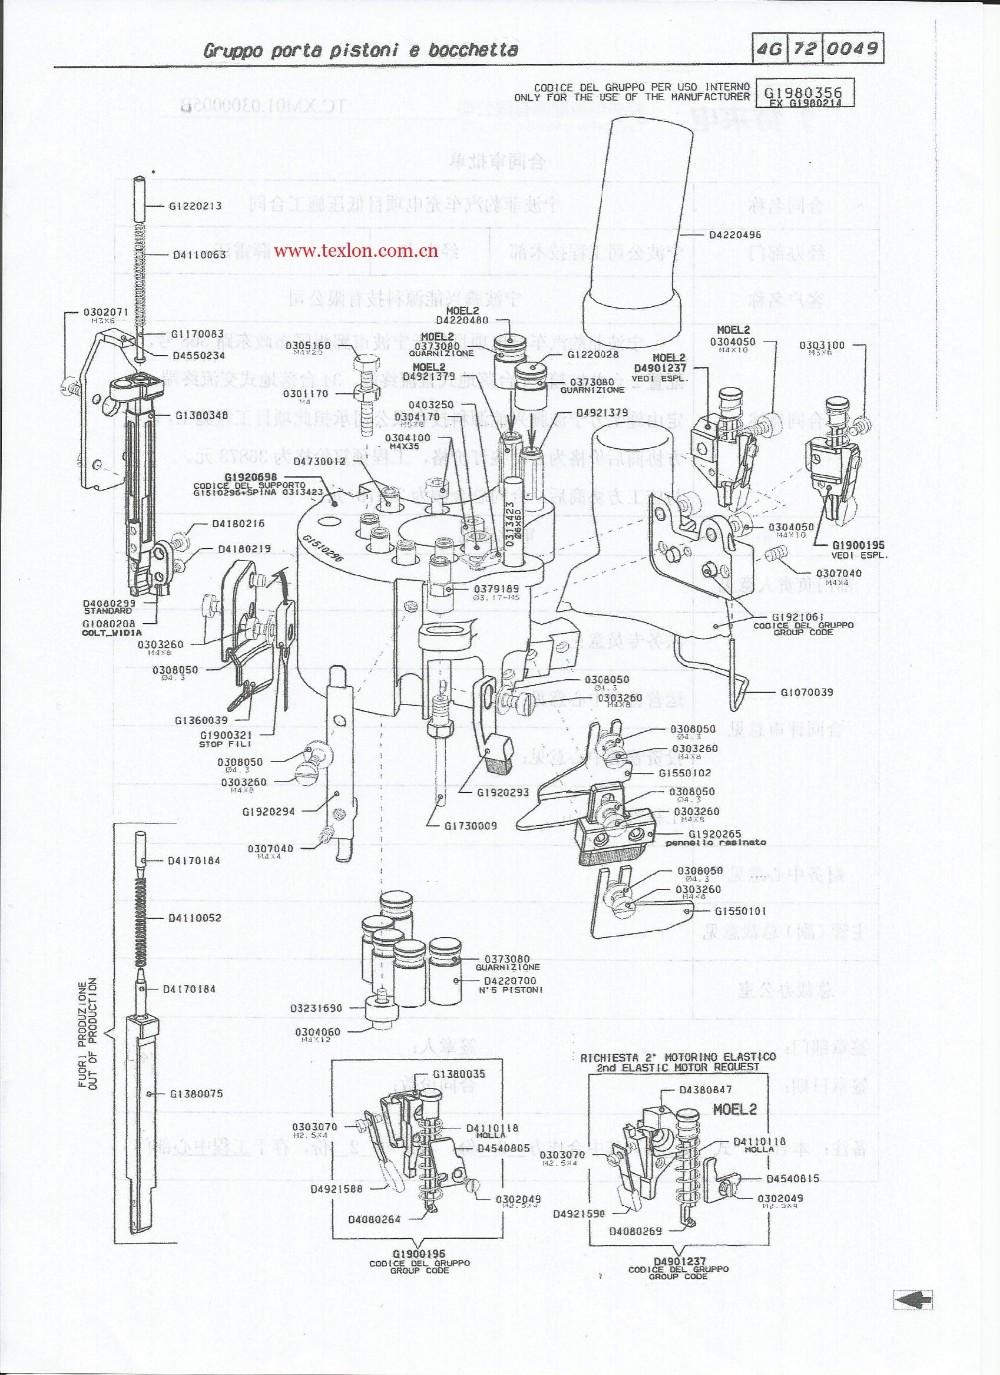 Buy Santoni G615L Man Sock Knitting Machine Use Dial Knife Assembly G1380348 cheap